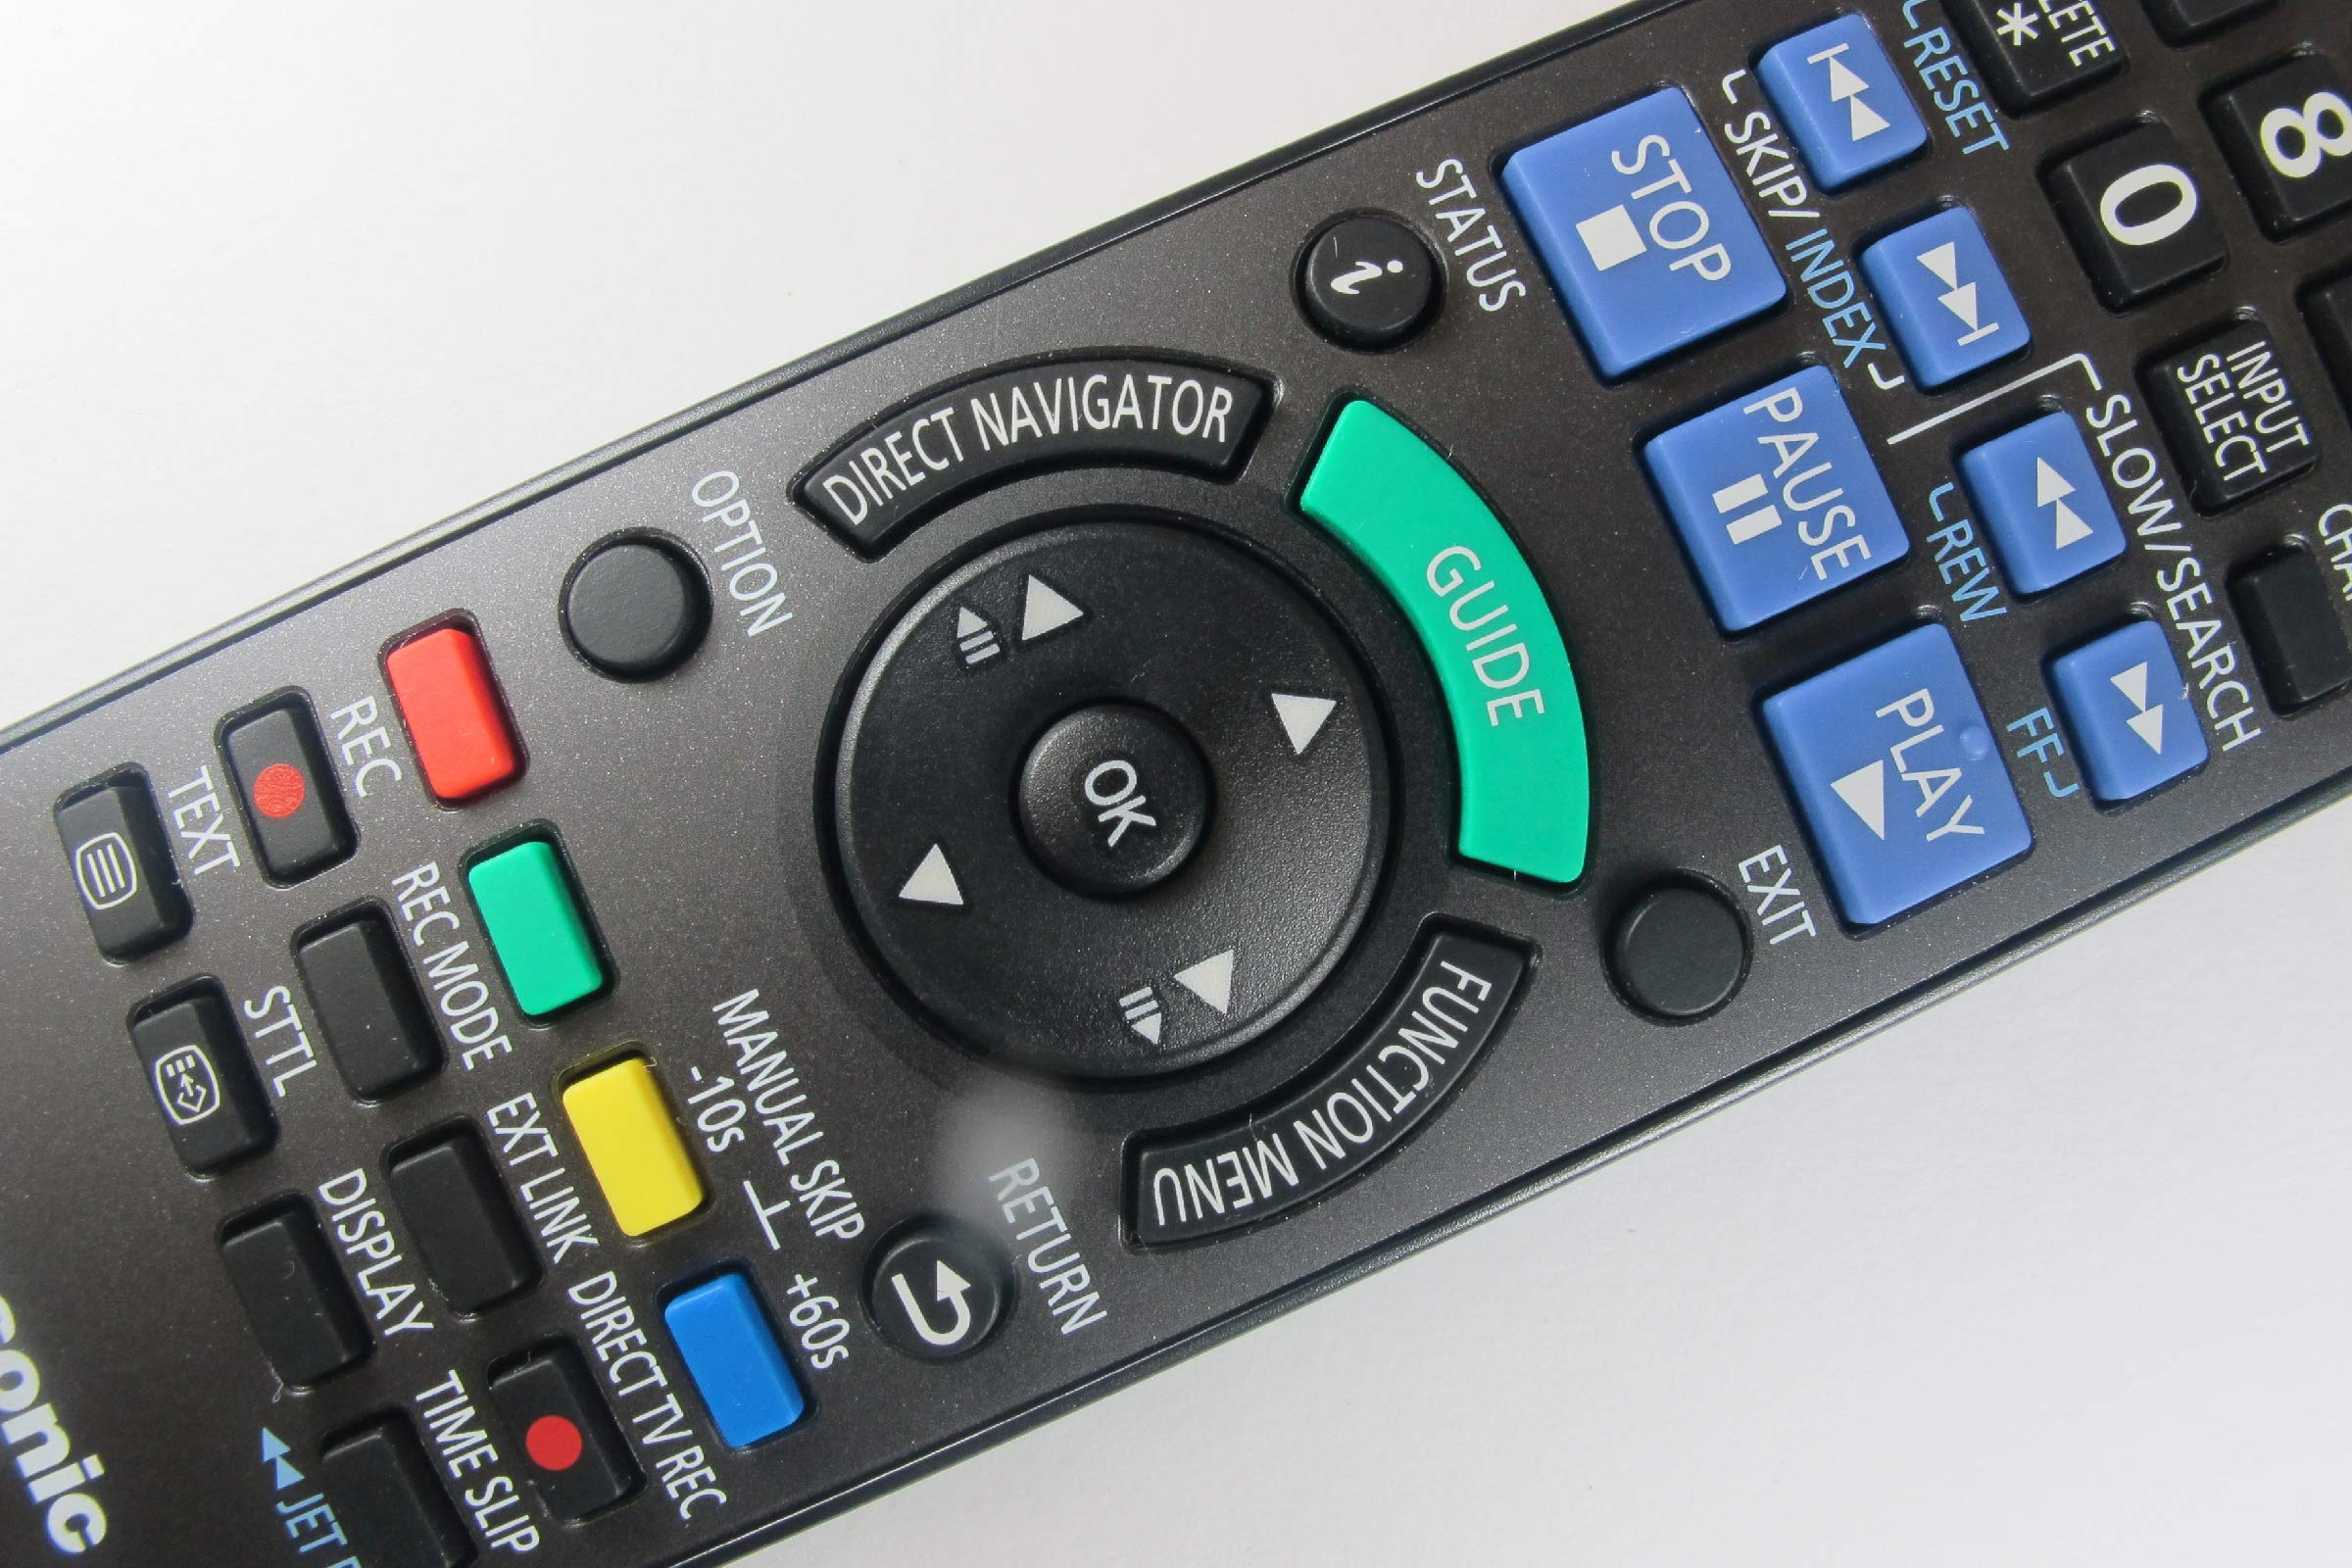 81GjcuaK0oL - Panasonic DMR-EZ49VEBK Genuine DVD Recorder Remote Control N2QAYB000466